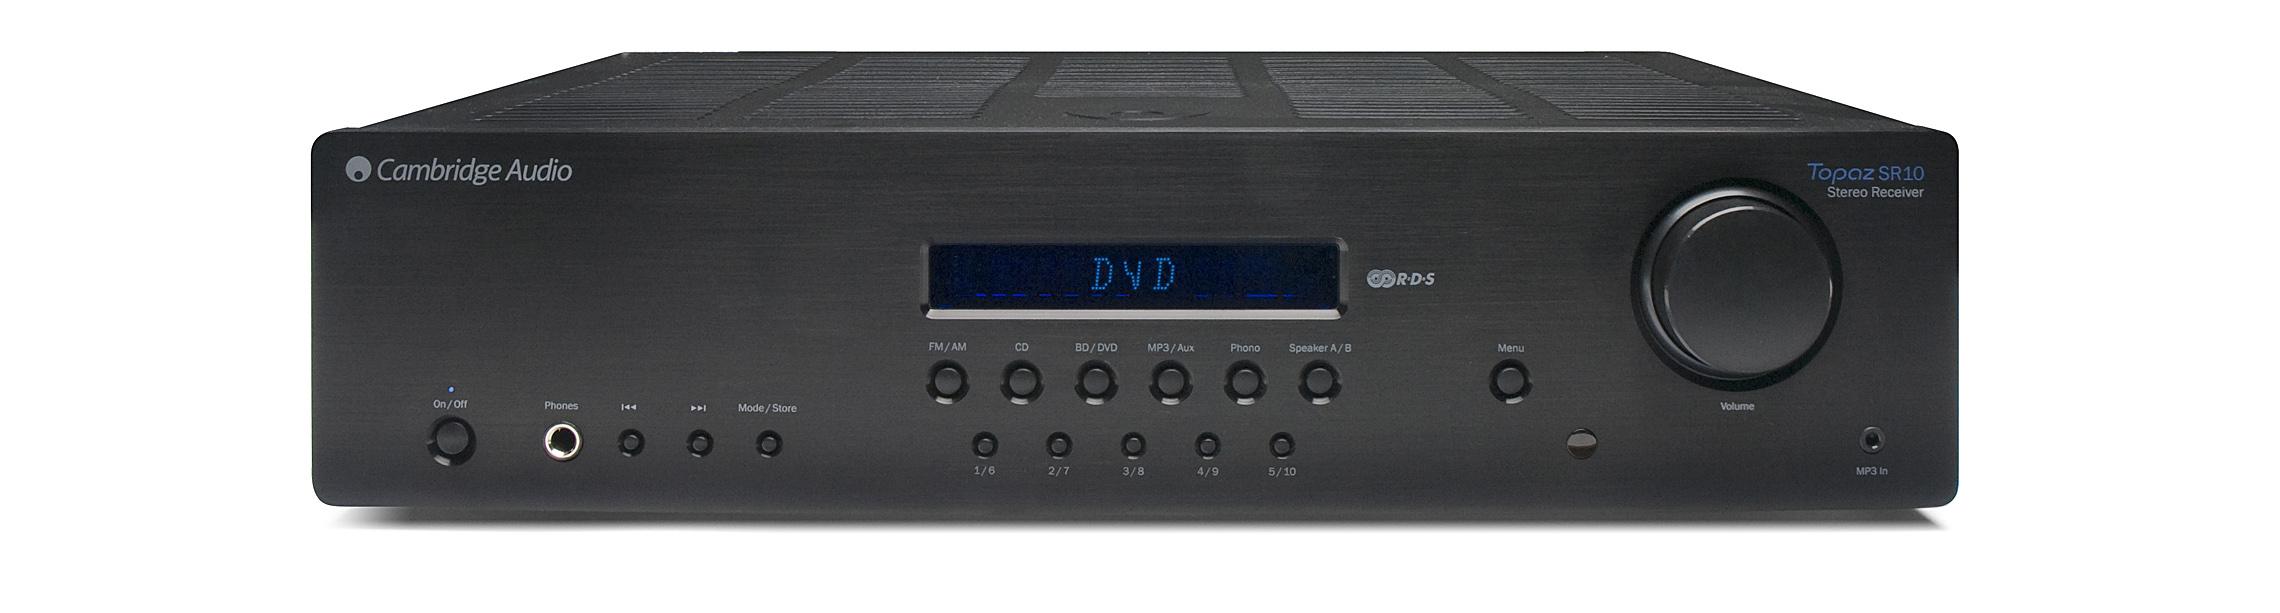 【Topaz SR10 綜合擴大機】 Cambridge Audio 英國劍橋音響 家庭劇院 CD BD AV 擴大機 數位串流 收音機